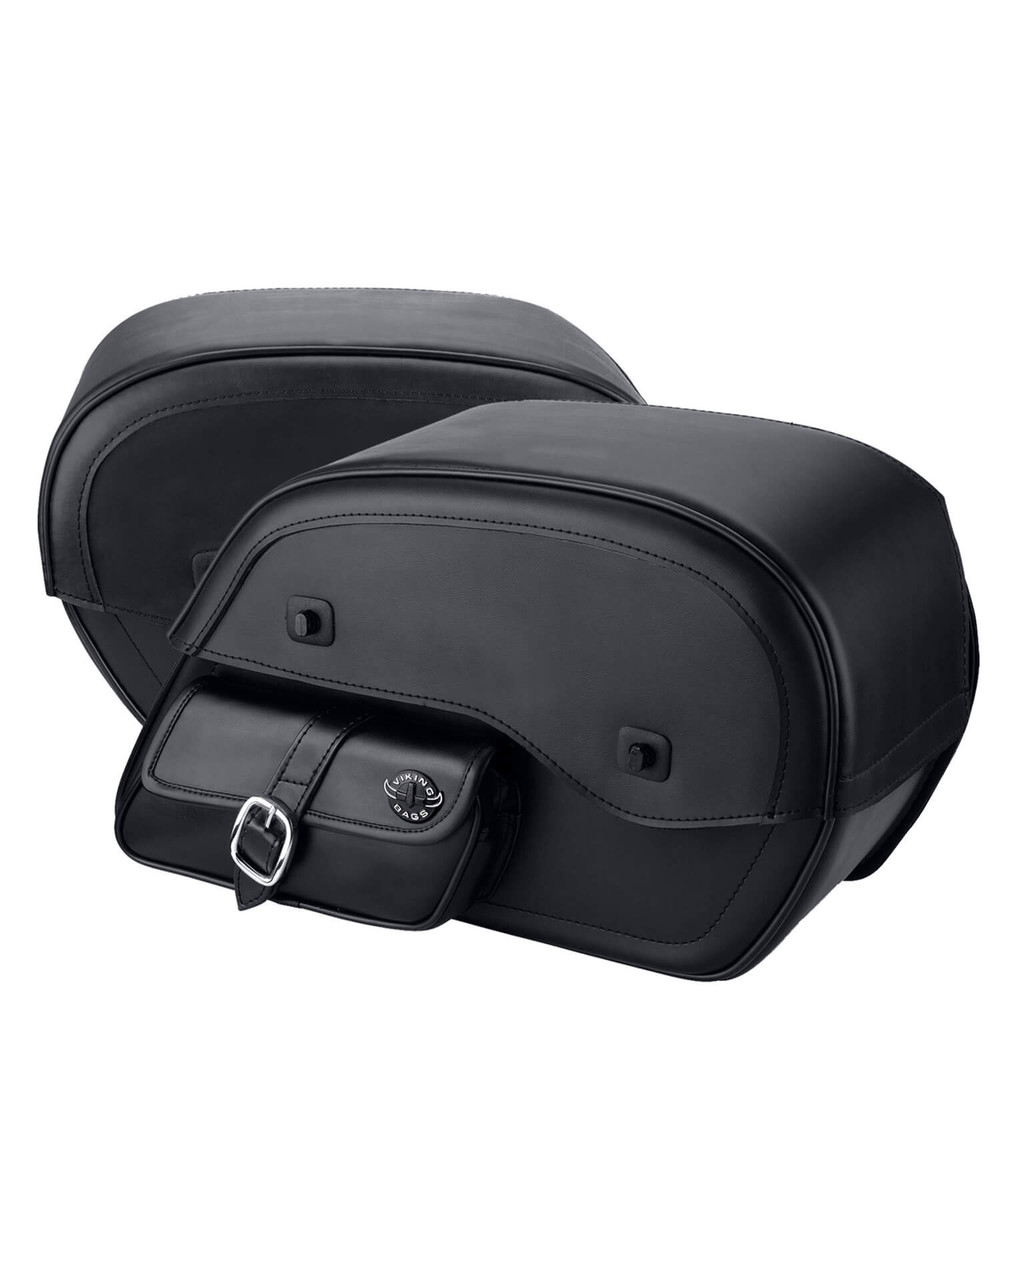 Honda VTX 1300 C SS Side Pocket Motorcycle Saddlebags both bags view